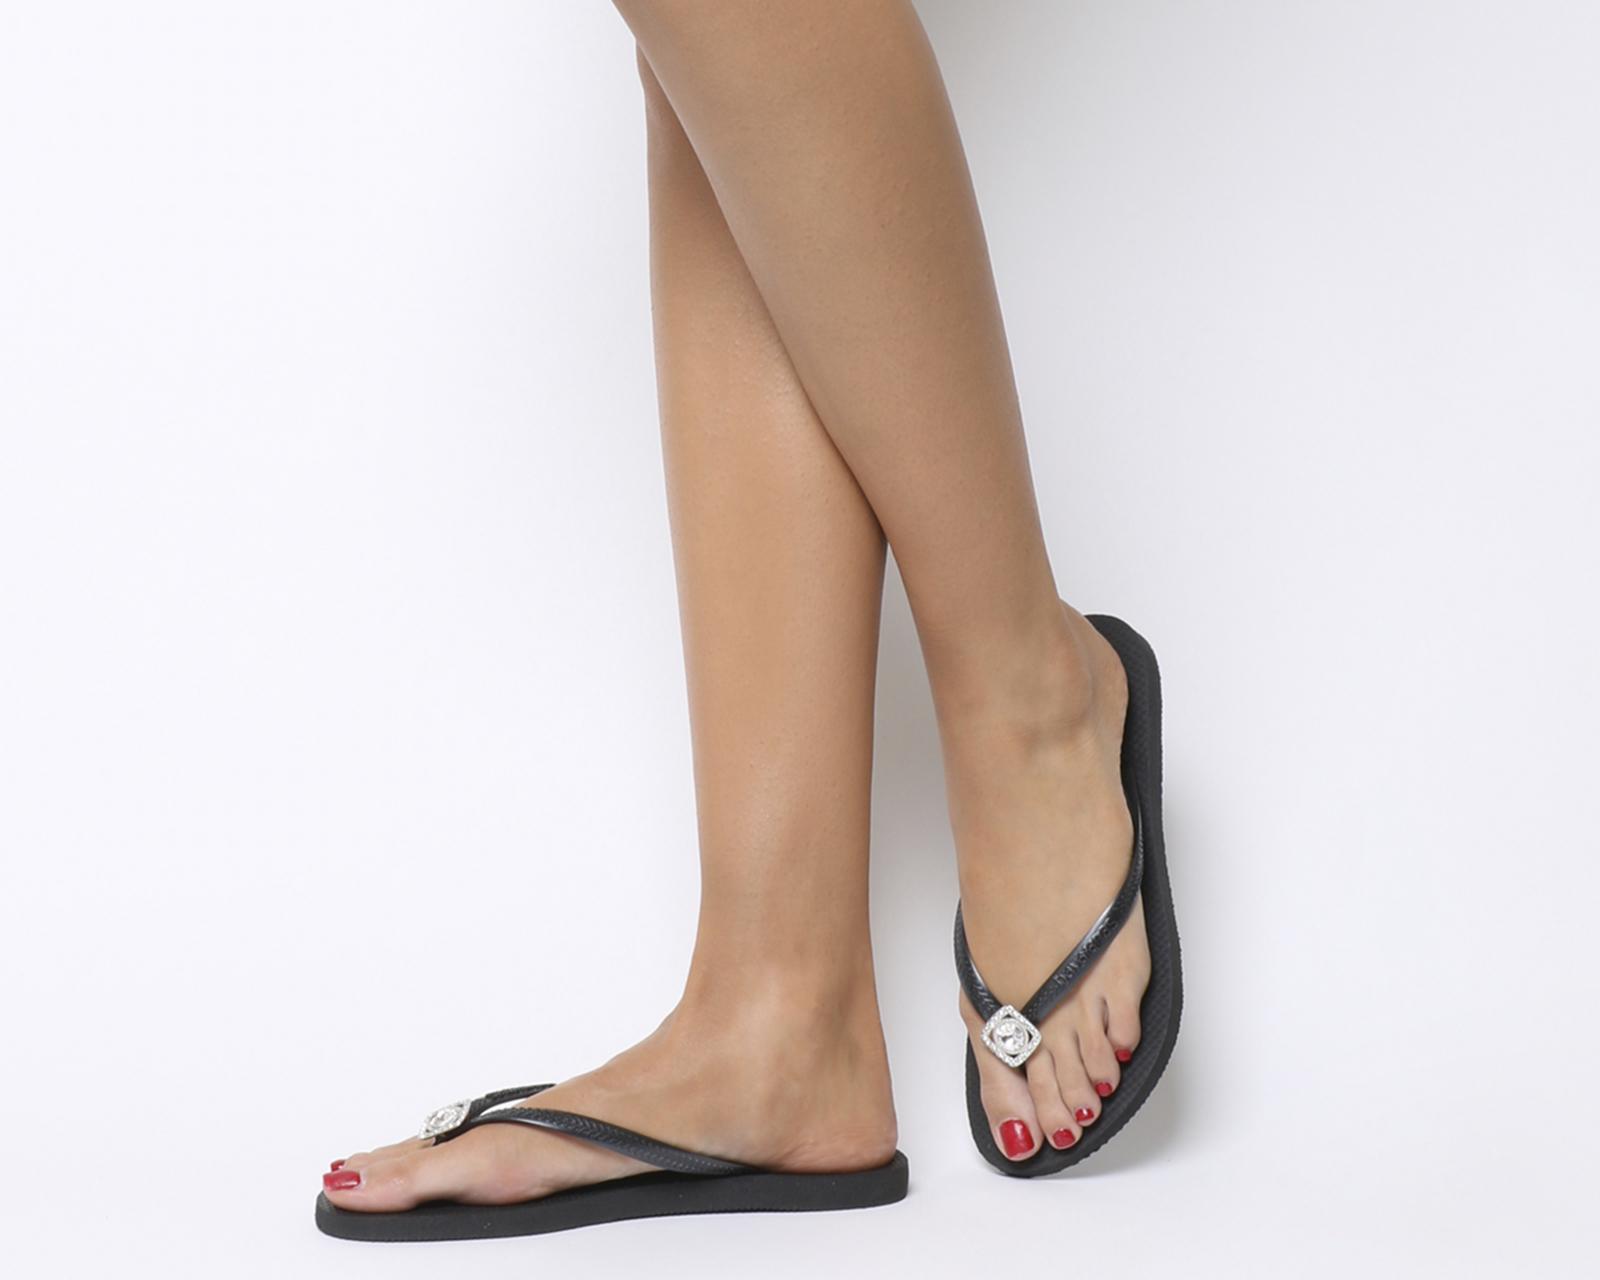 37828de6a47a Sentinel Womens Havaianas Slim Crystal Poem Flip Flops Black Sandals